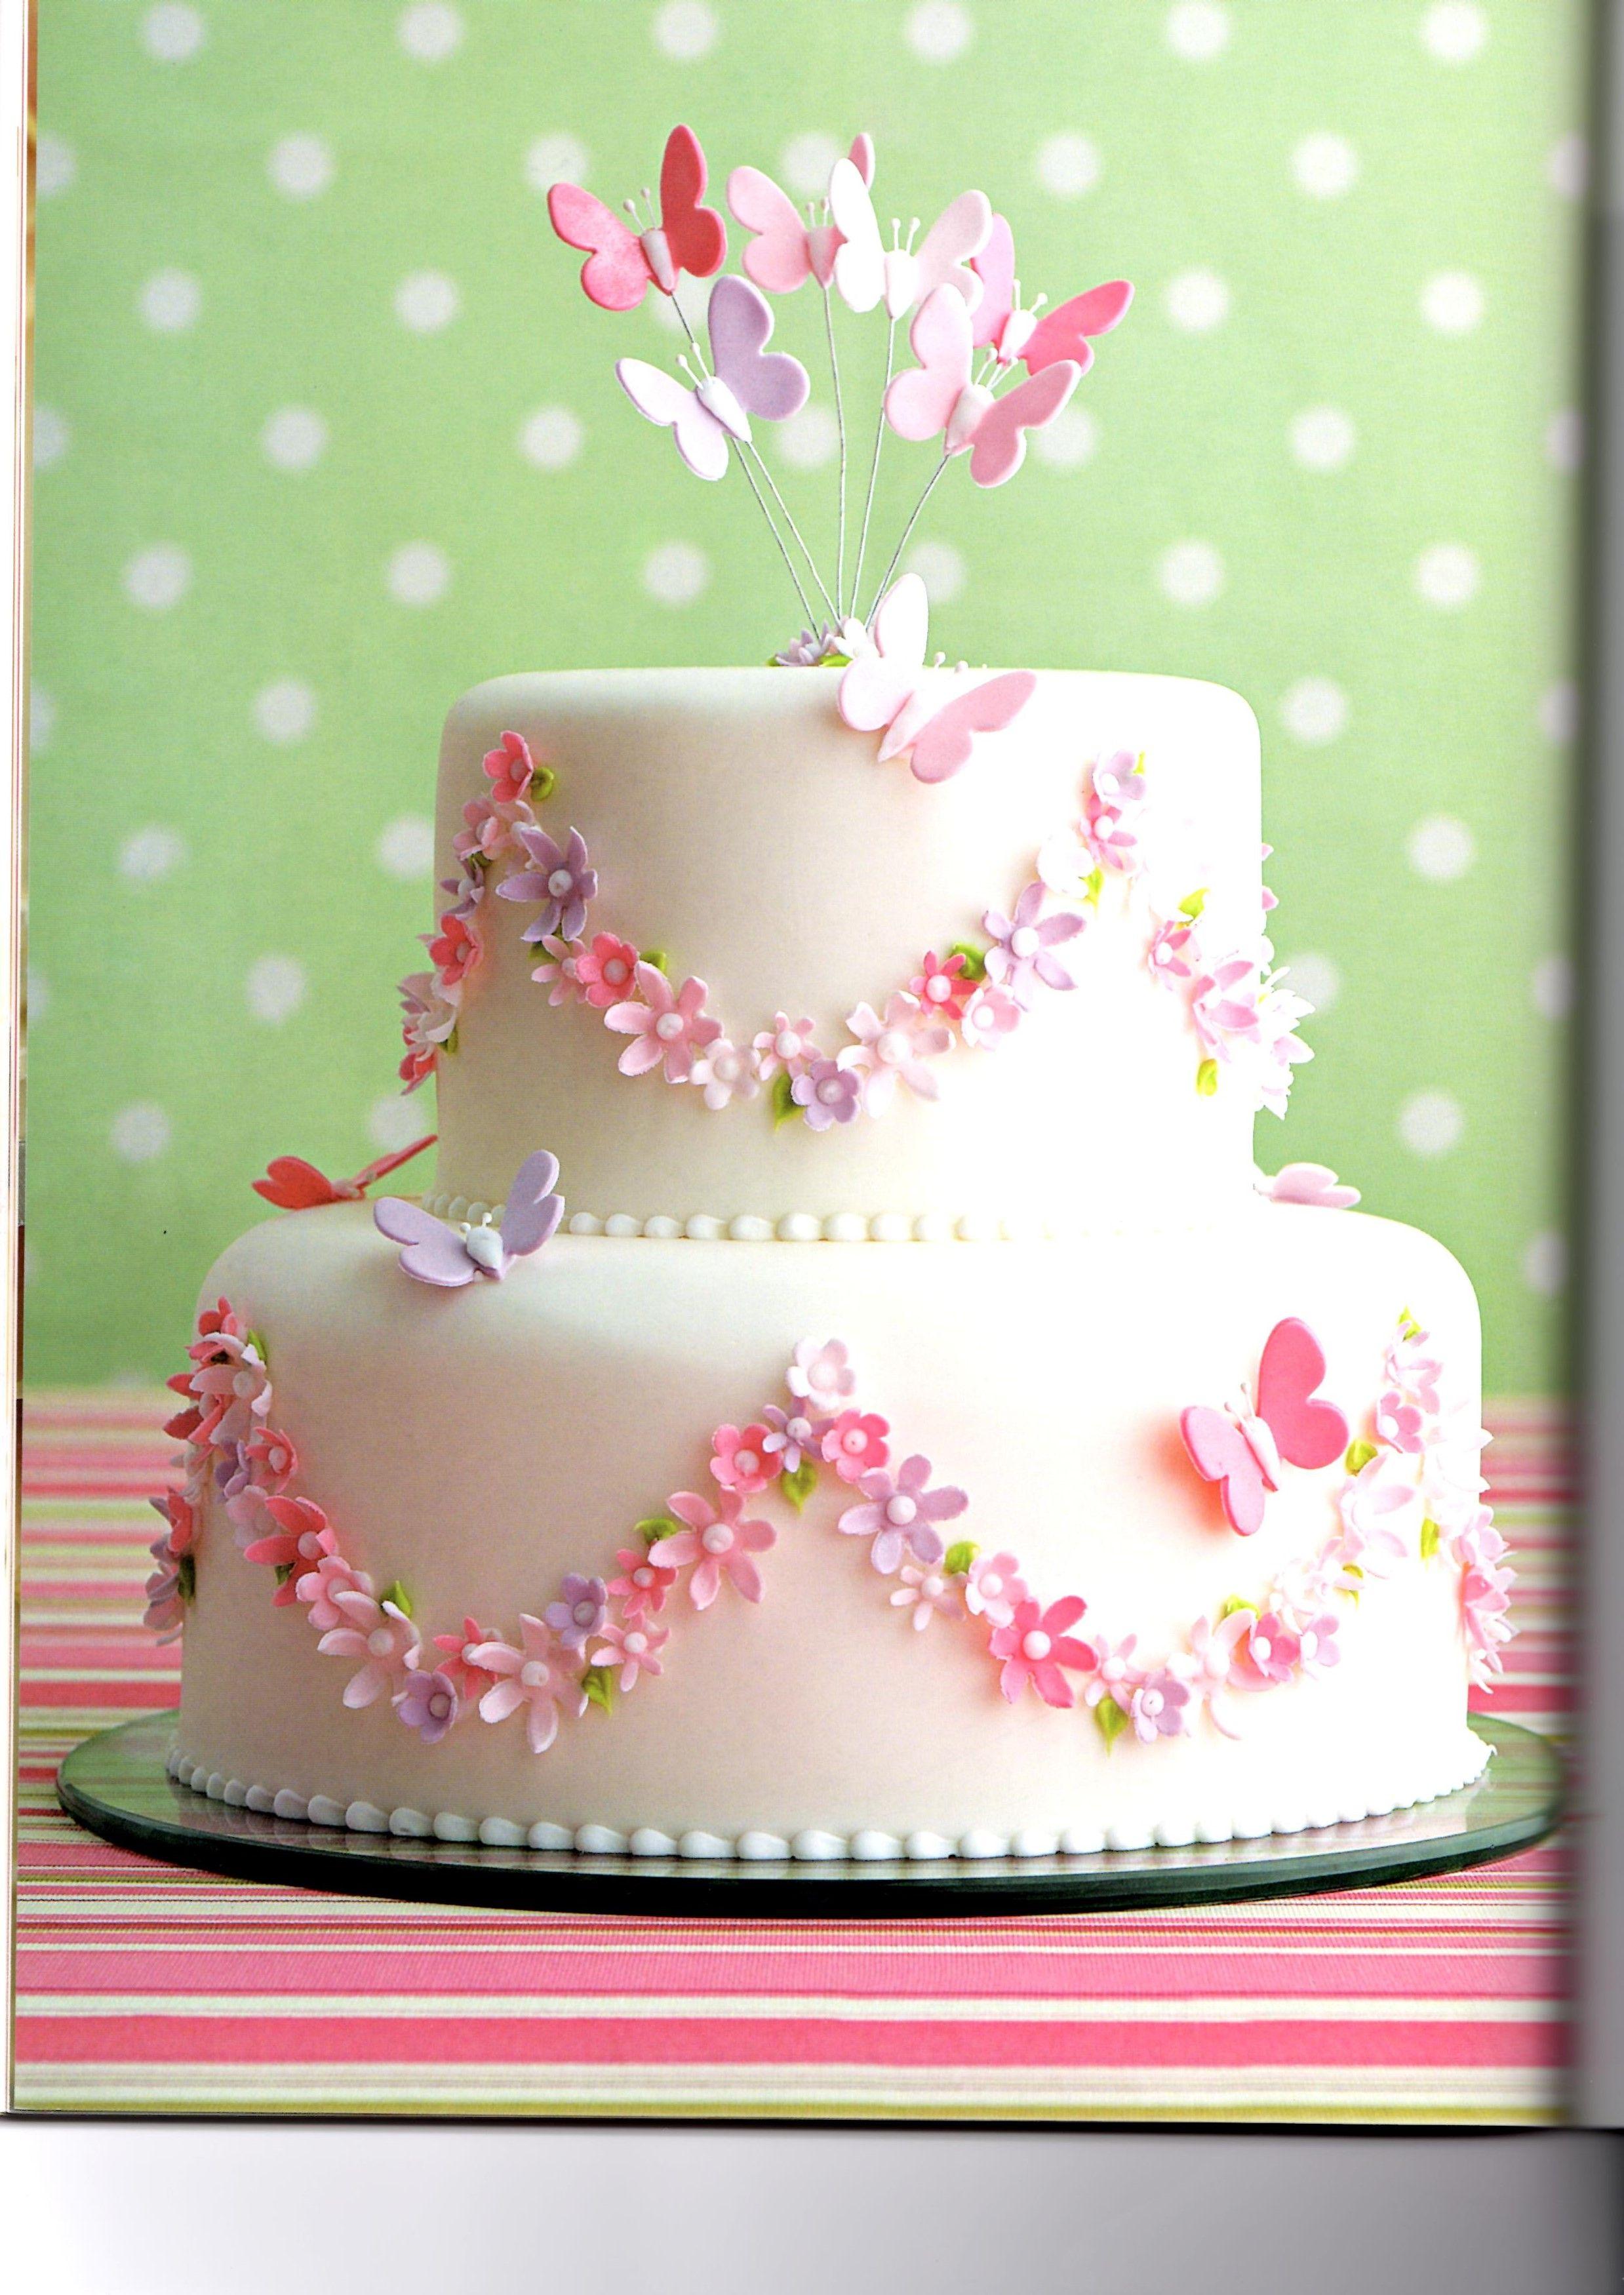 Girly cake idea